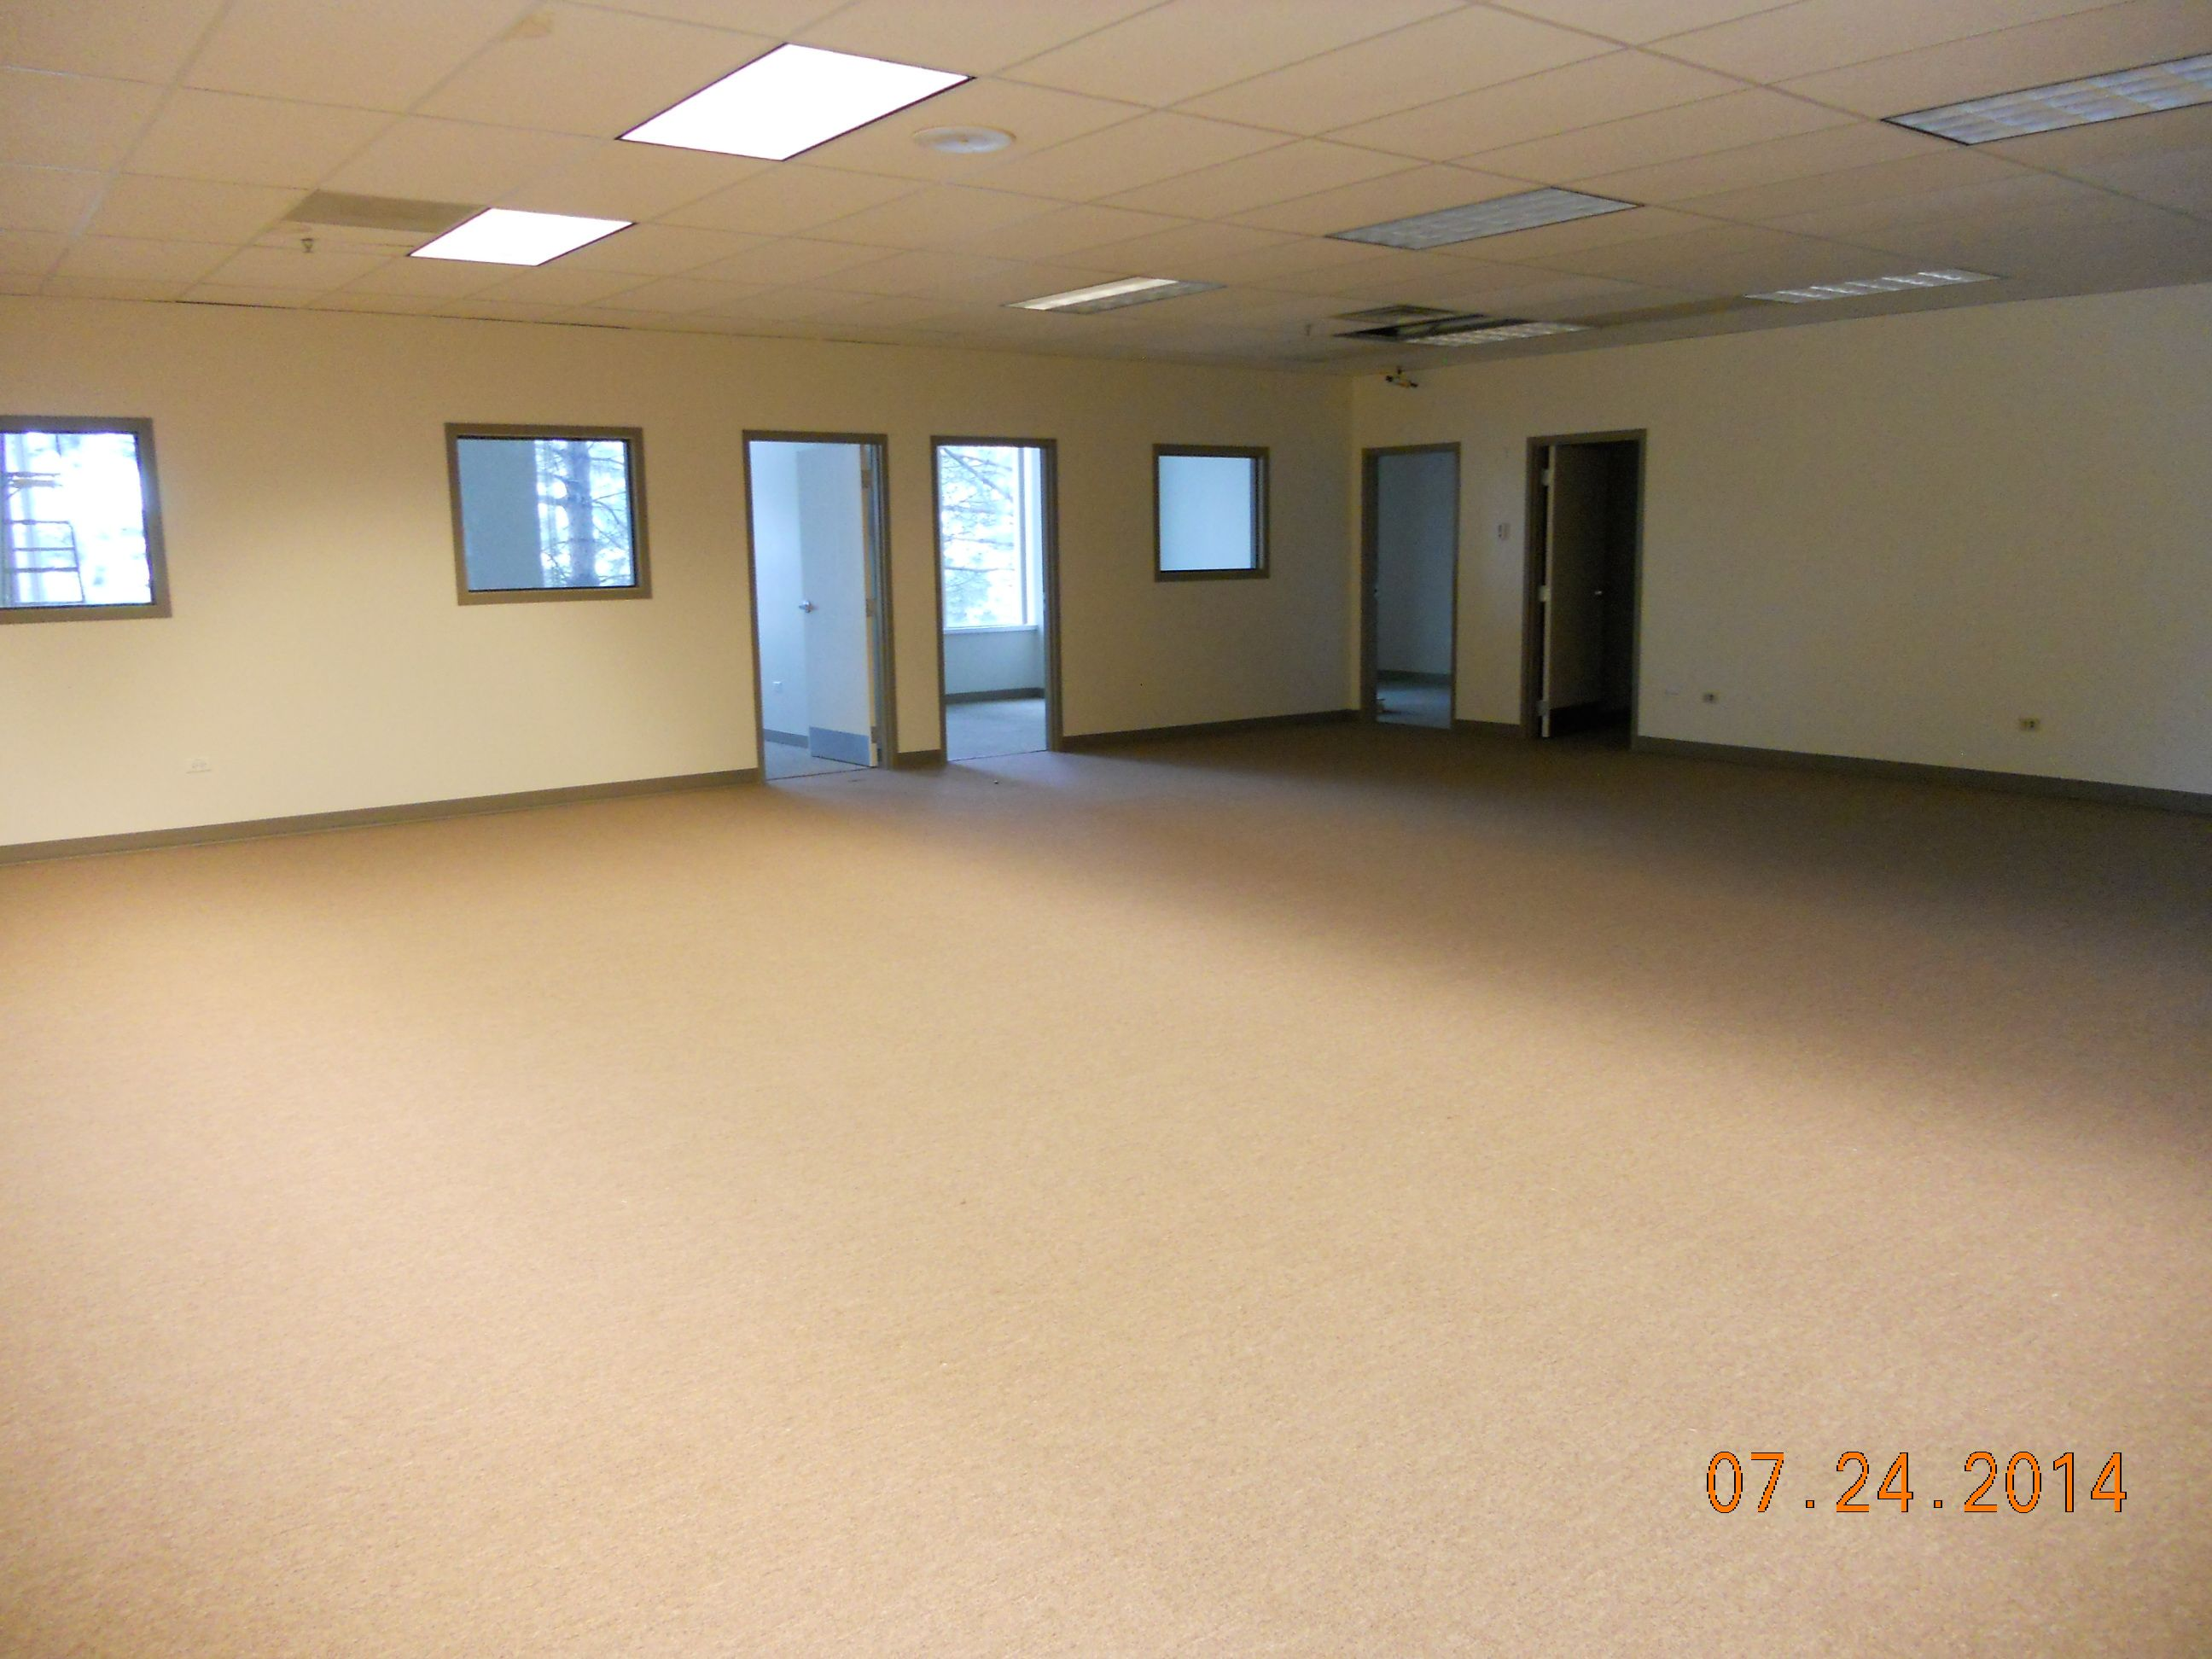 Ipc Main Office Amp Bull Pen Area Building Renovation